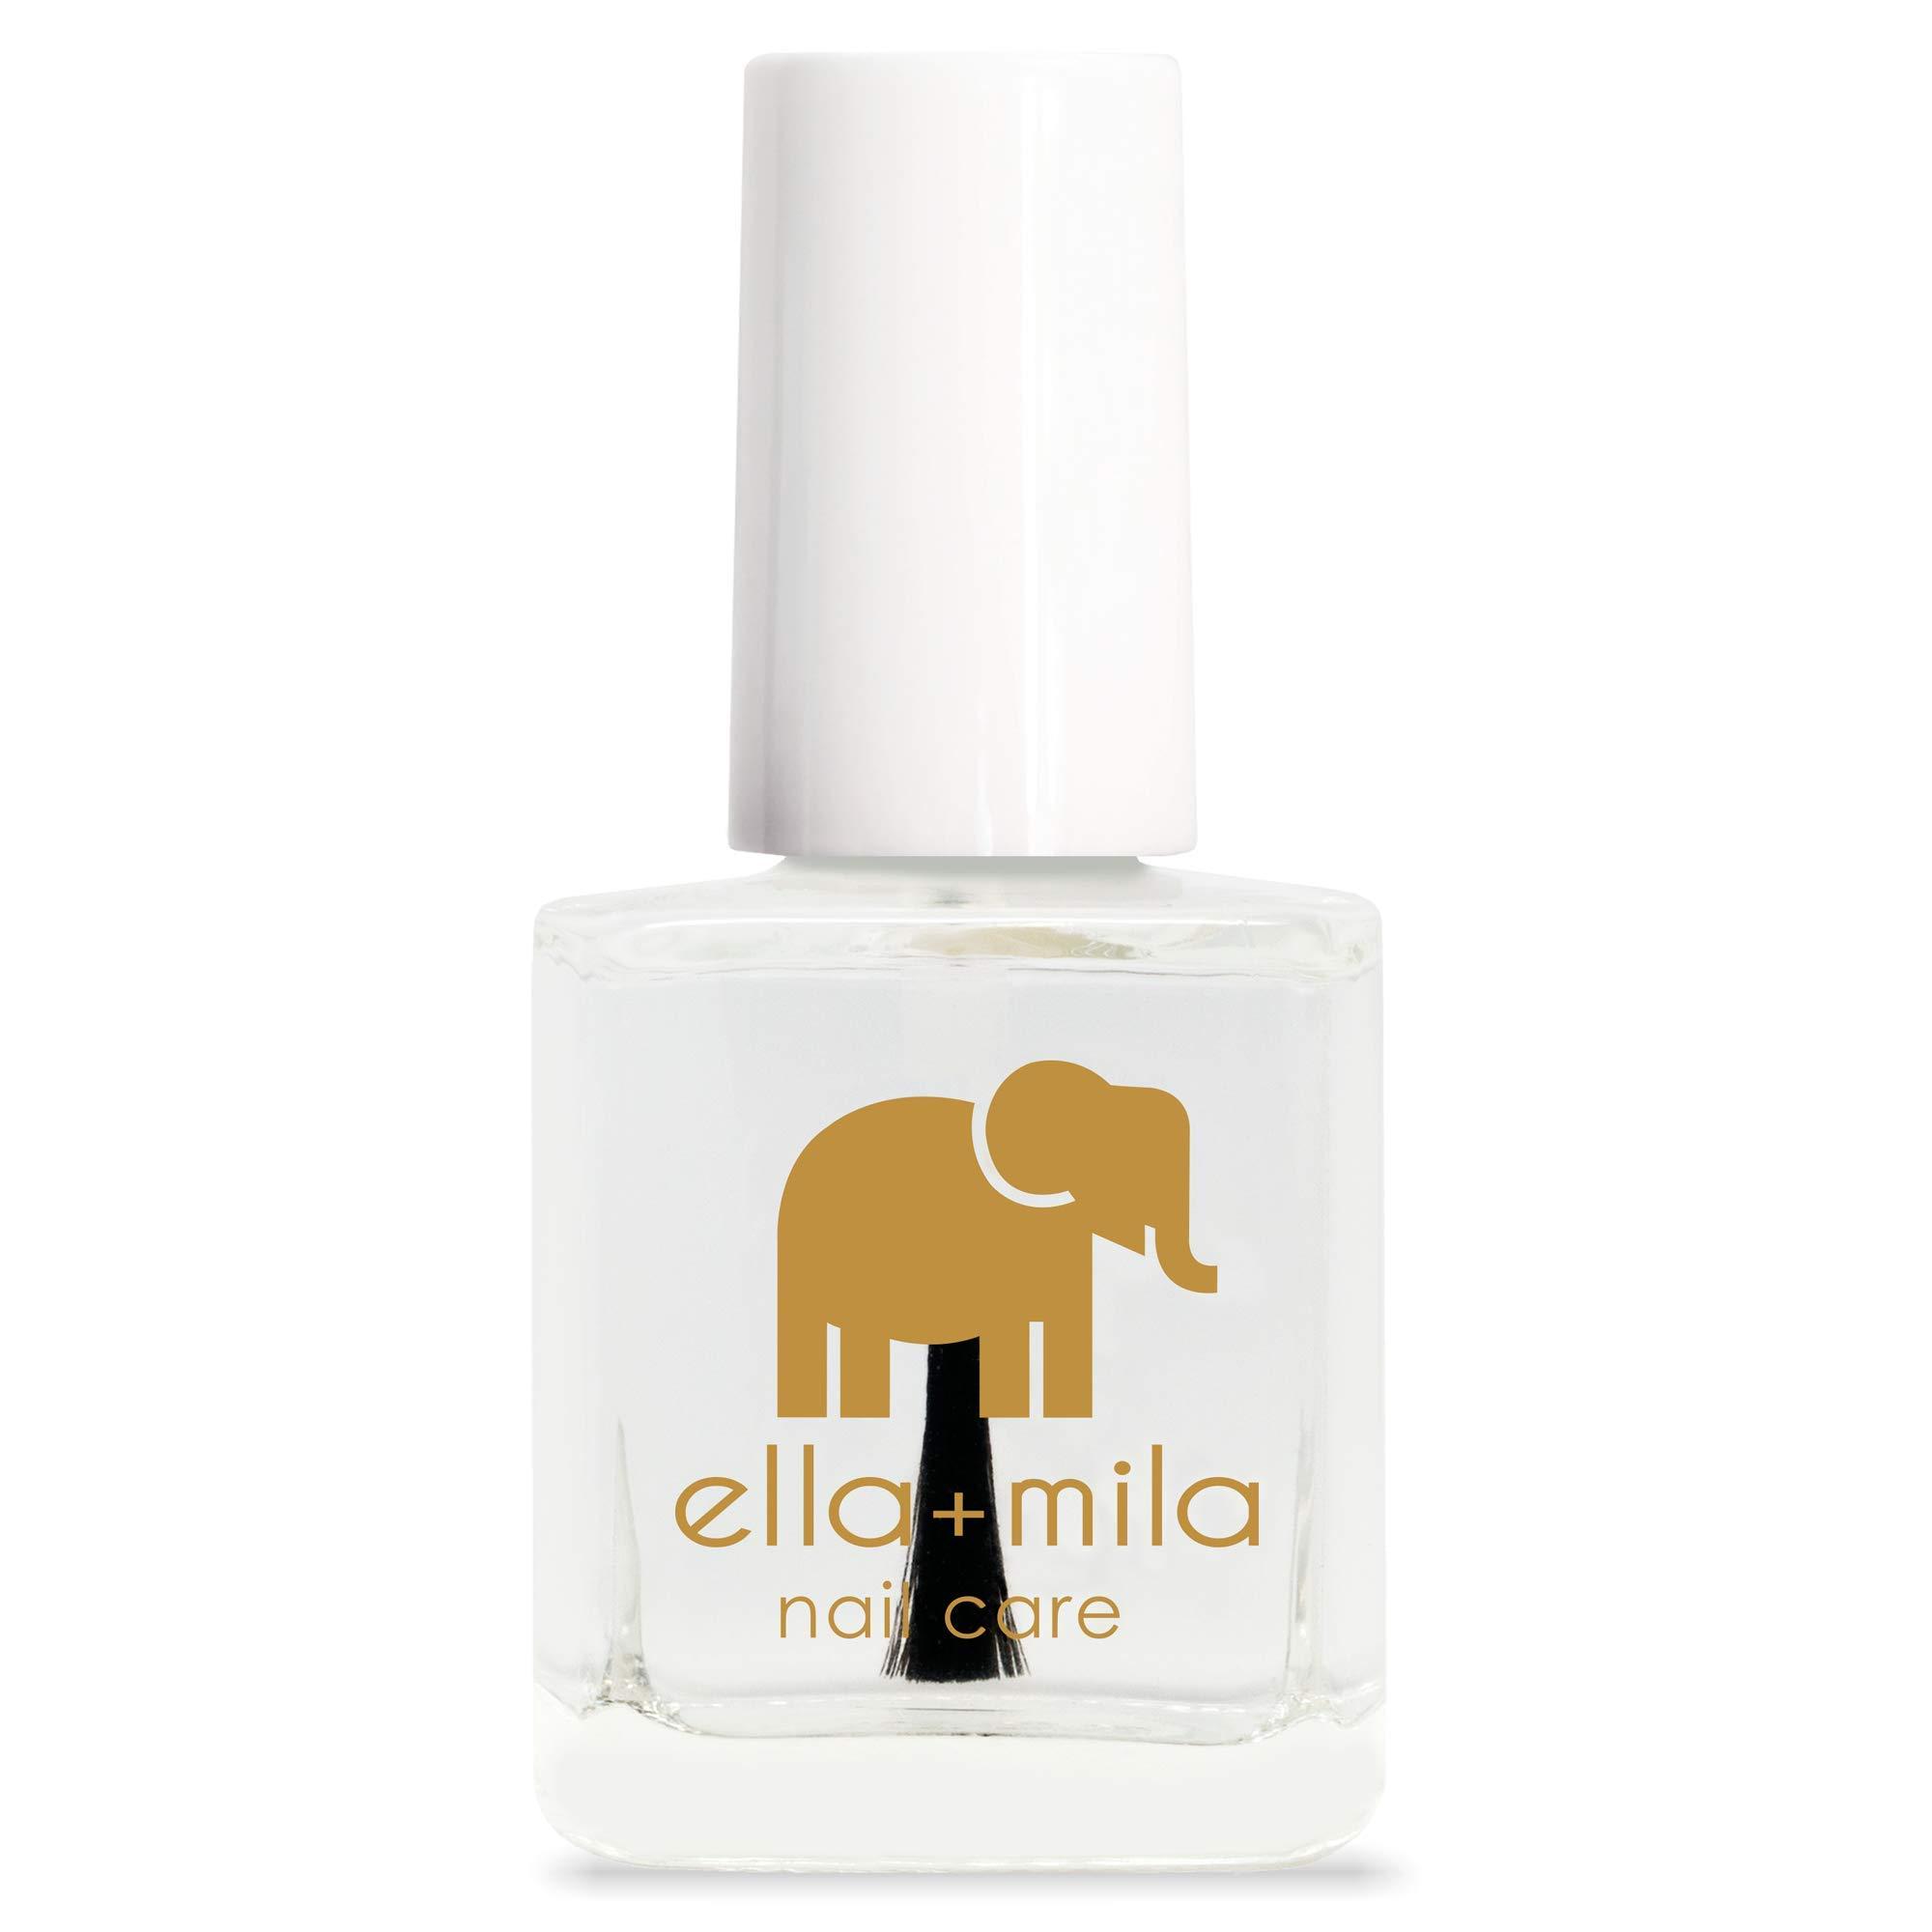 ella+mila Nail Care, Matte Top Coat - Matte-ly in Love by ella mila